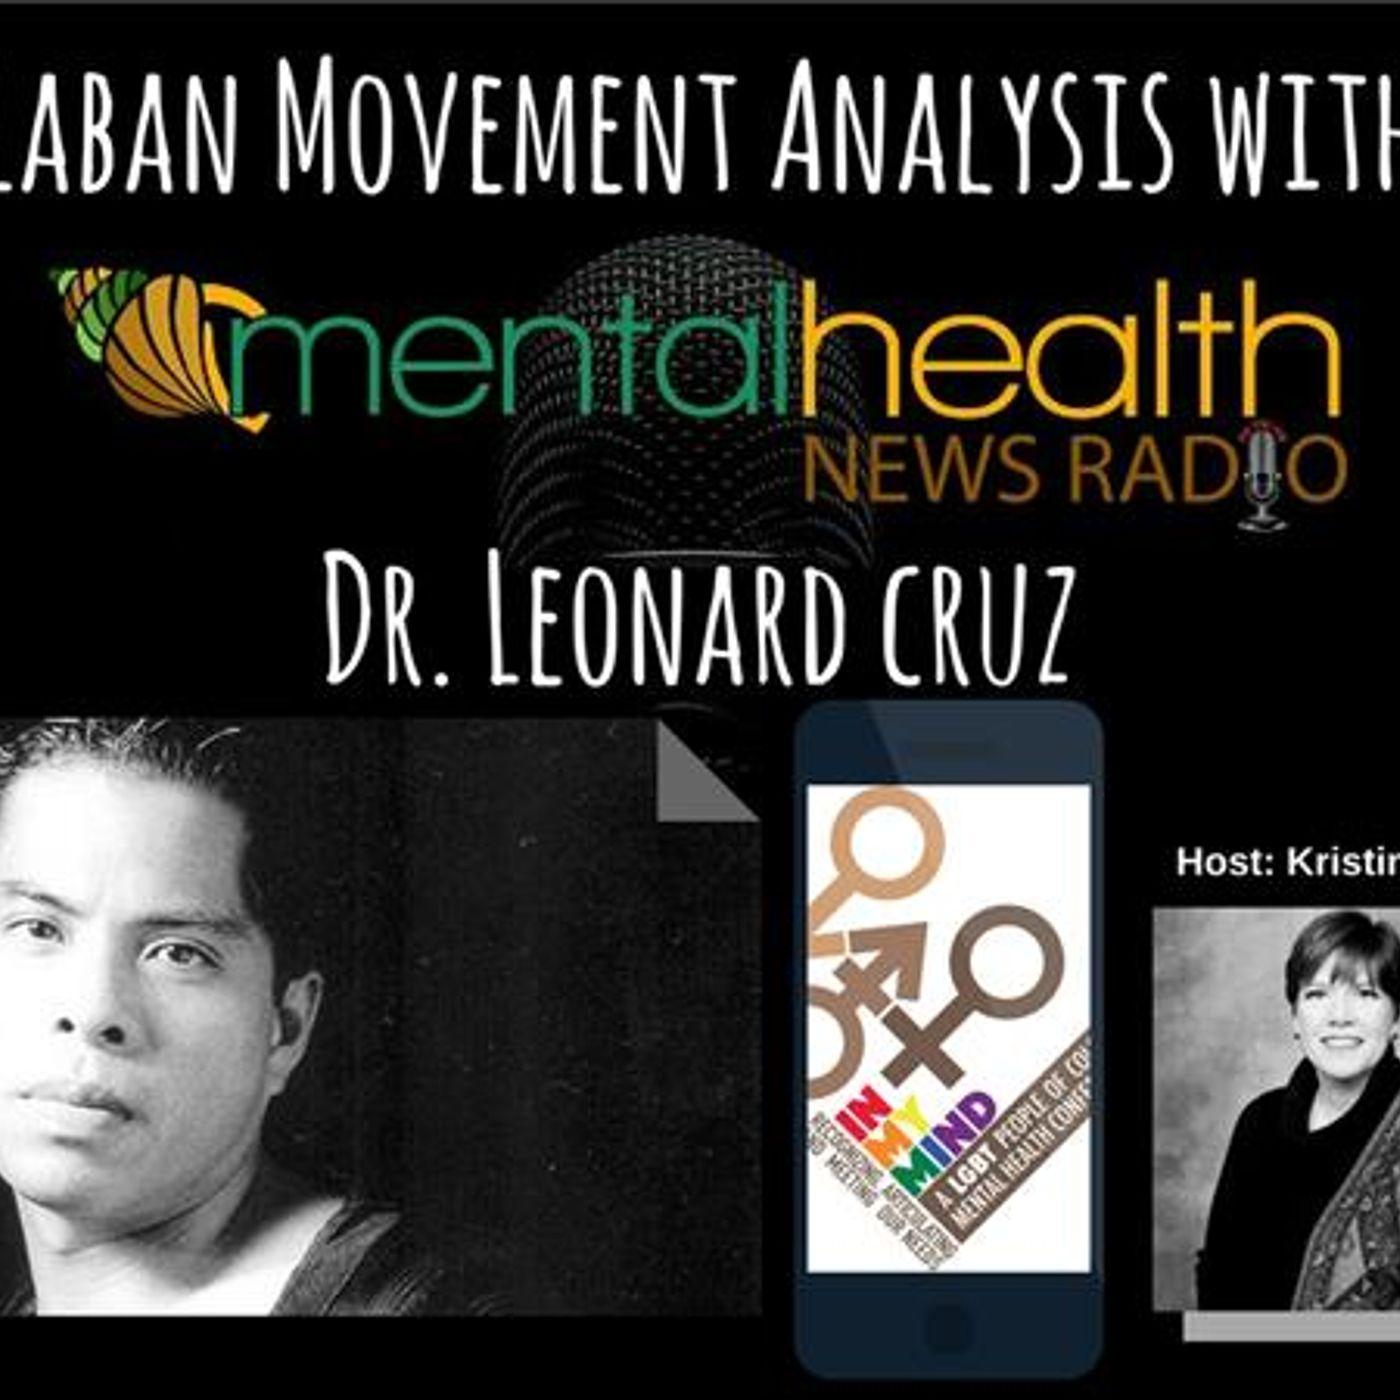 Mental Health News Radio - DBGM In My Mind Conference: Dr. Leonard Cruz on Laban Movement Analysis